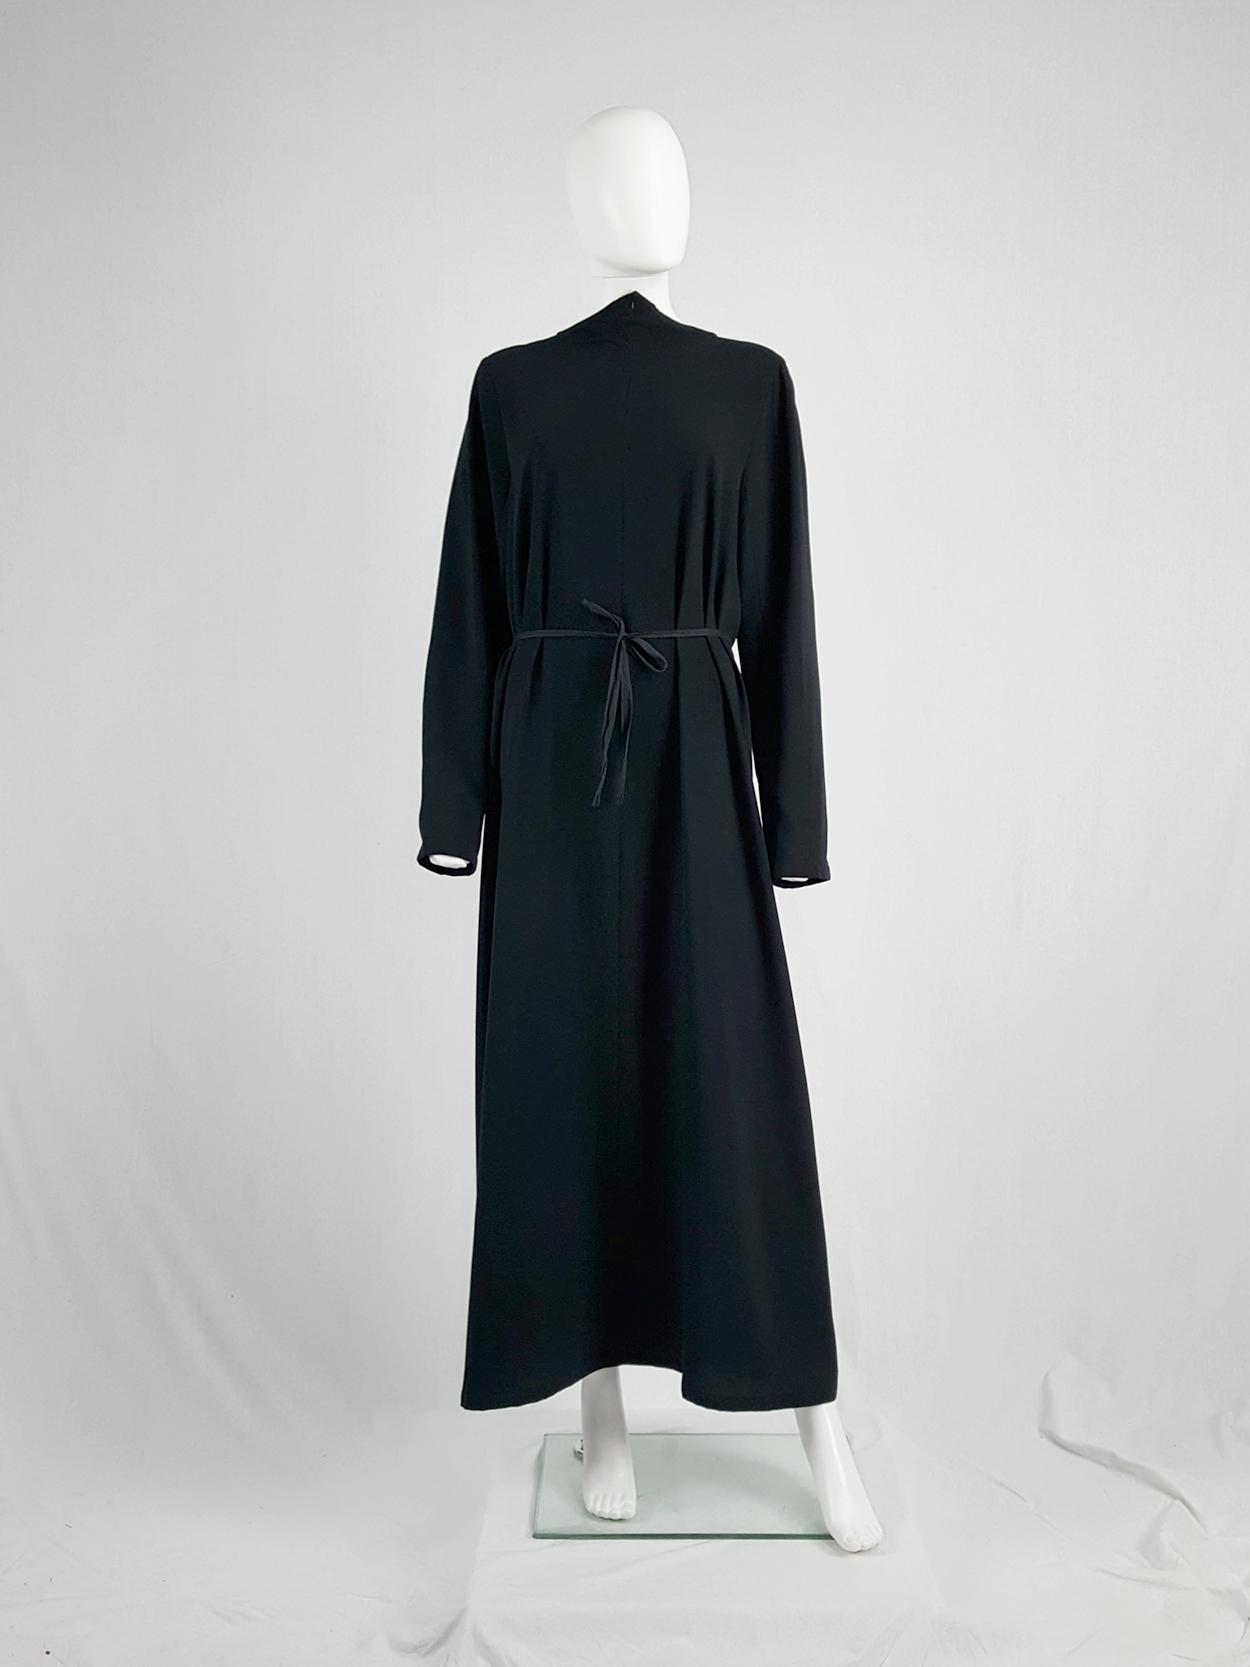 8536defb83 Maison Martin Margiela black backwards maxi dress — spring 1999 ...